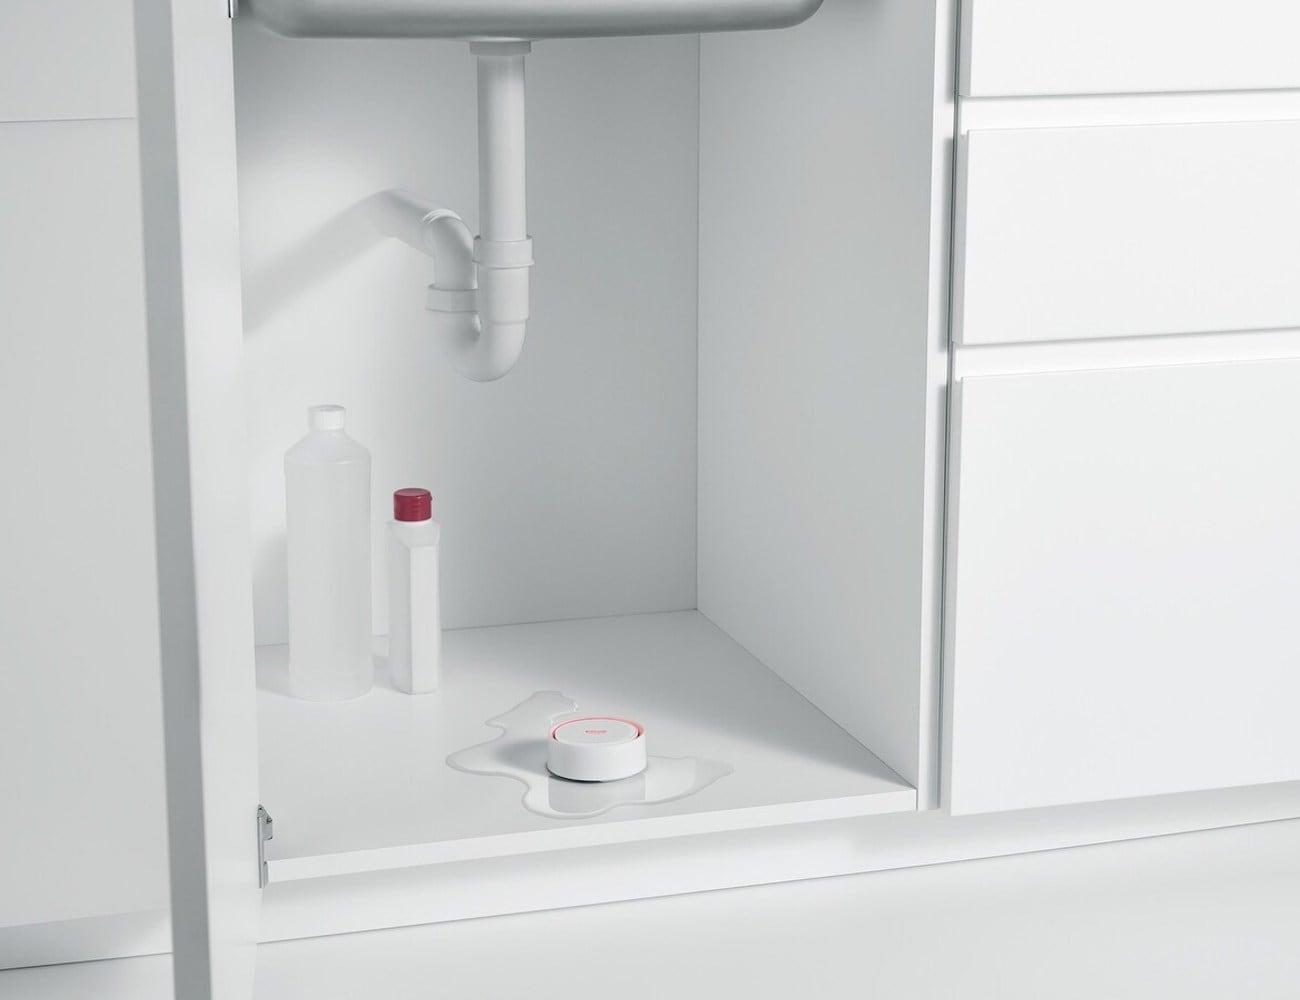 GROHE Sense Smart Water Sensor (4)